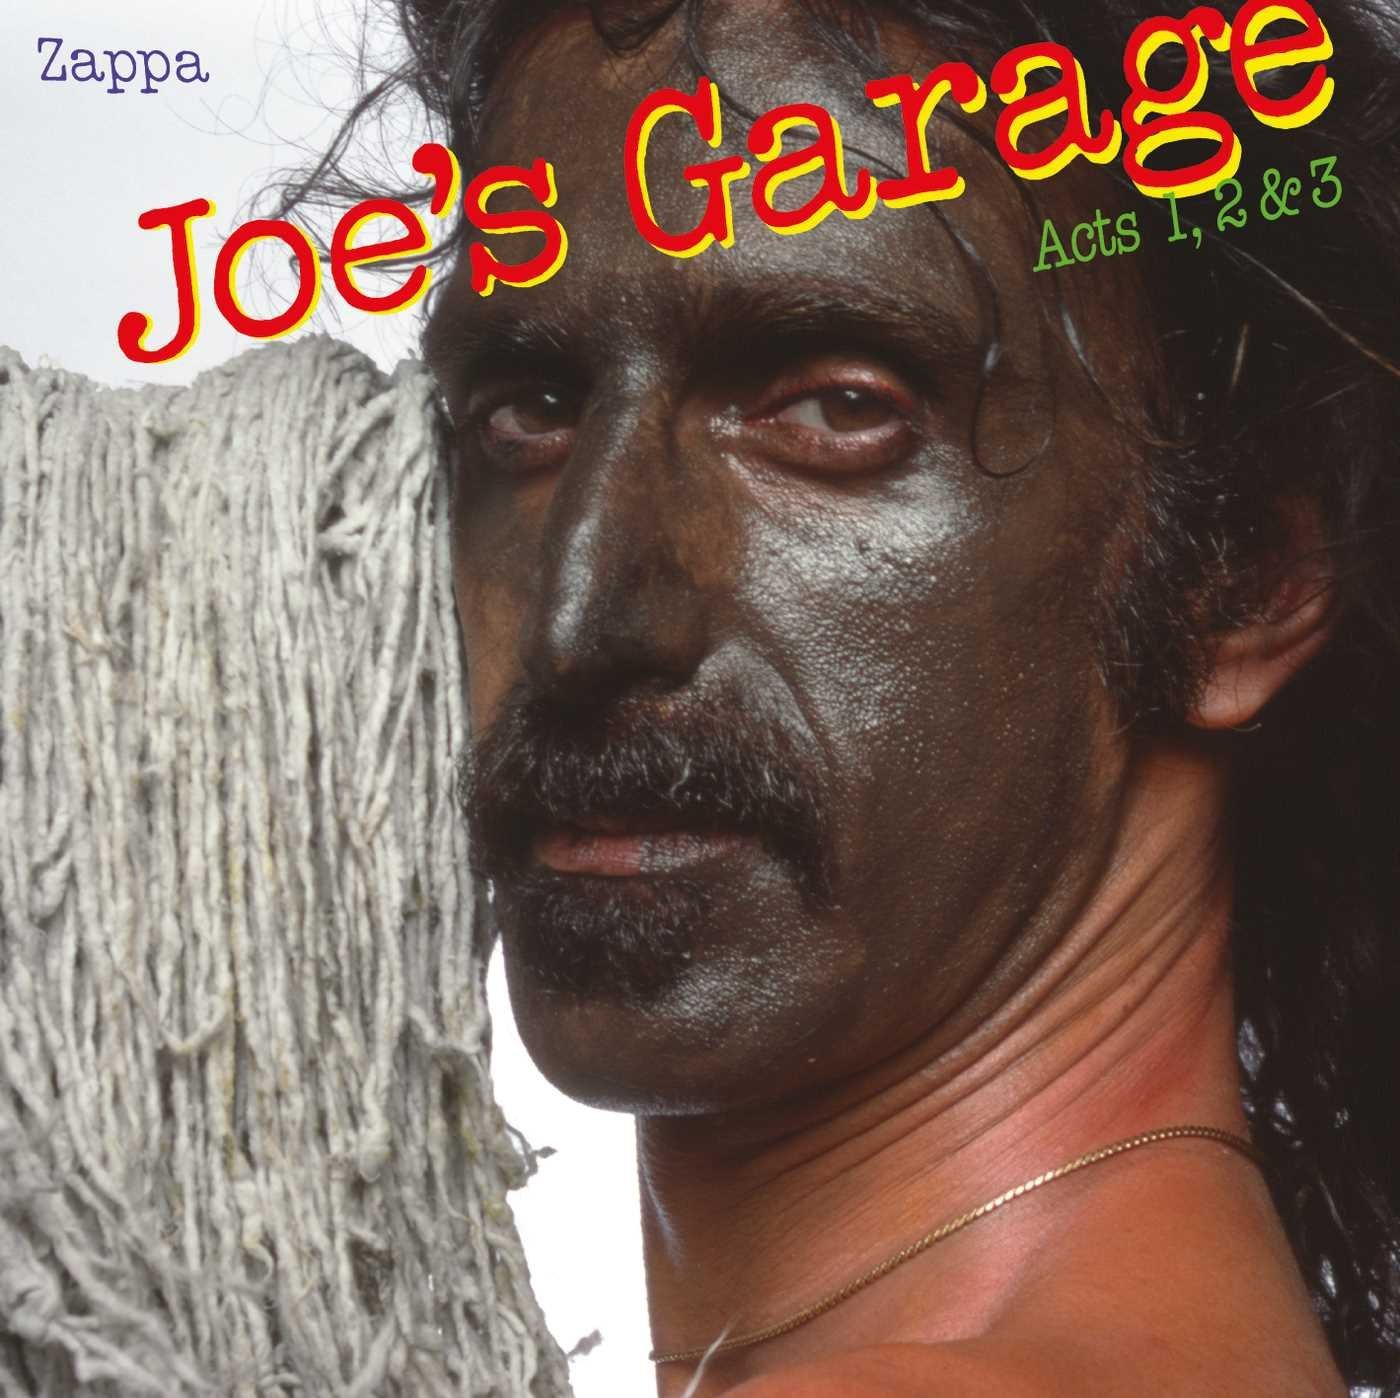 Copertina Vinile 33 giri Joe's Garage | Act I, II & III [3 LP] di Frank Zappa